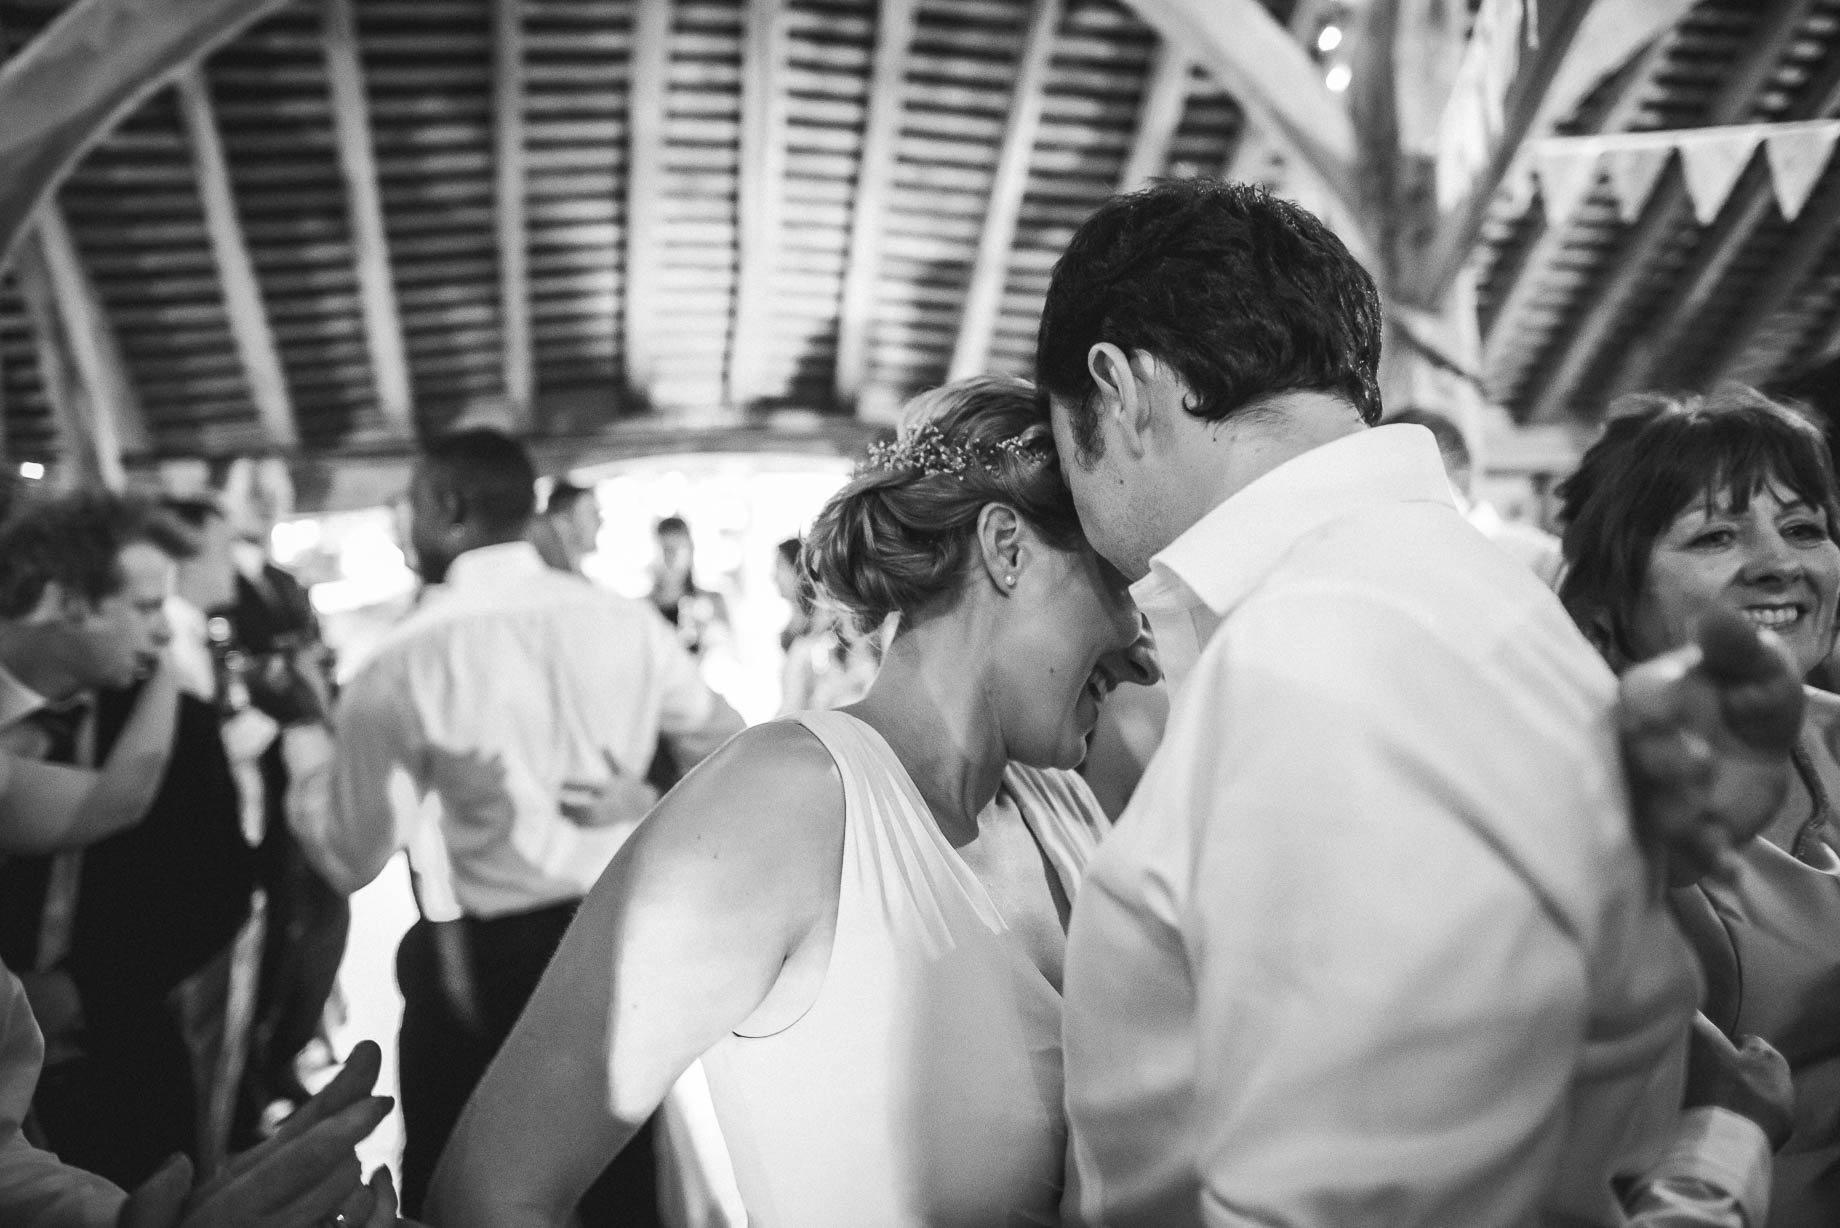 Gildings Barn wedding photography - Sarah and Steve (185 of 190)